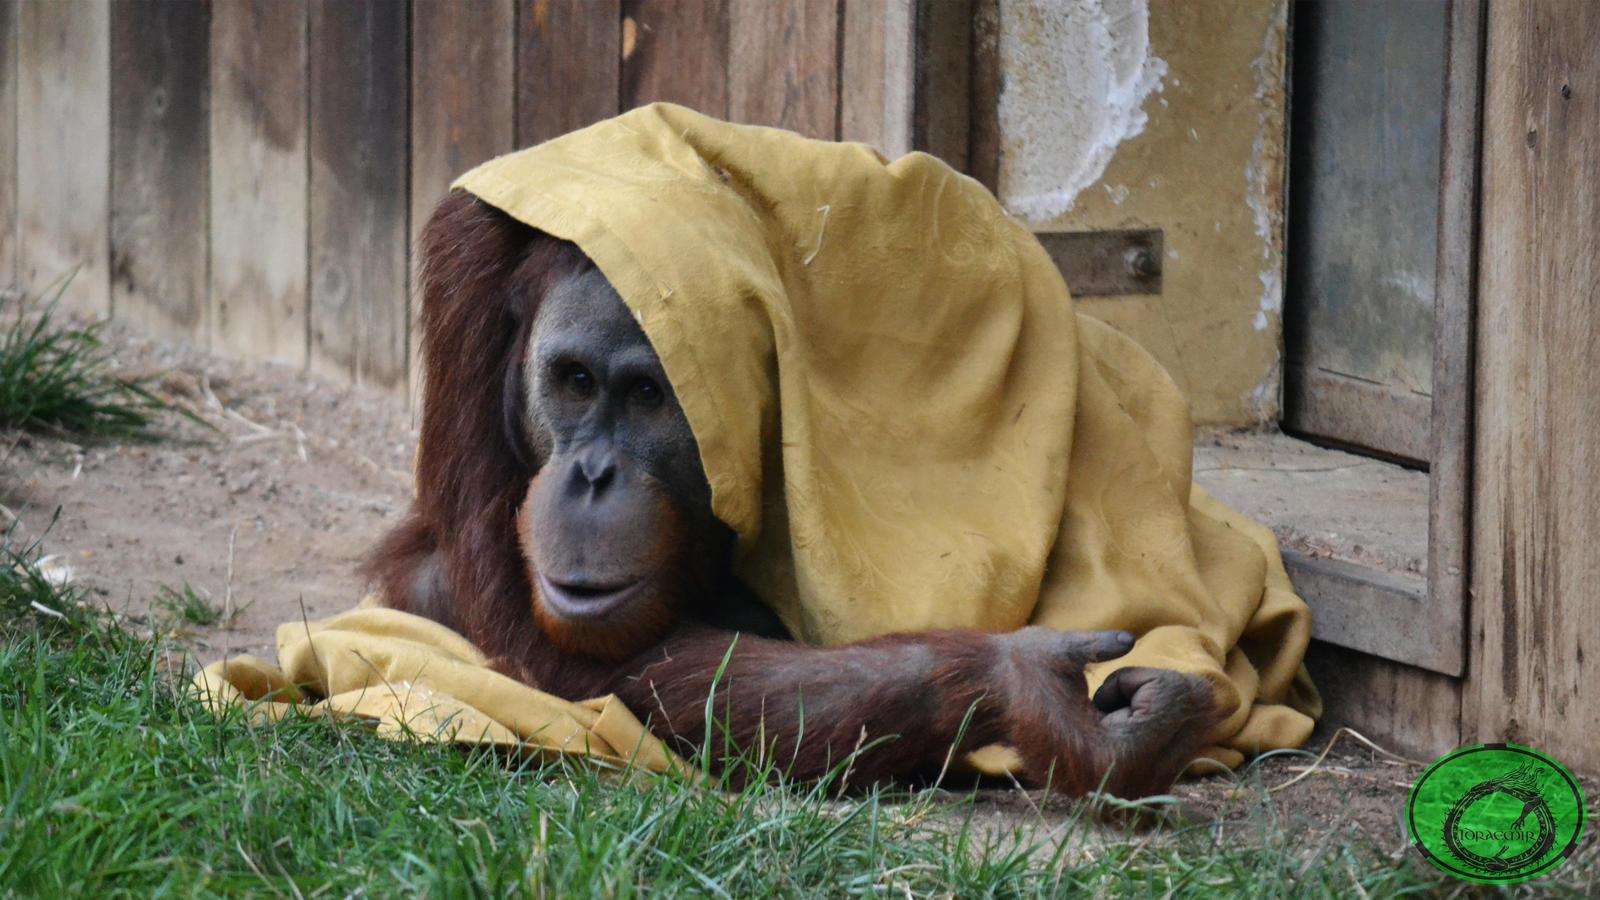 The Orangutan and the Blanket 01 by Idraemir